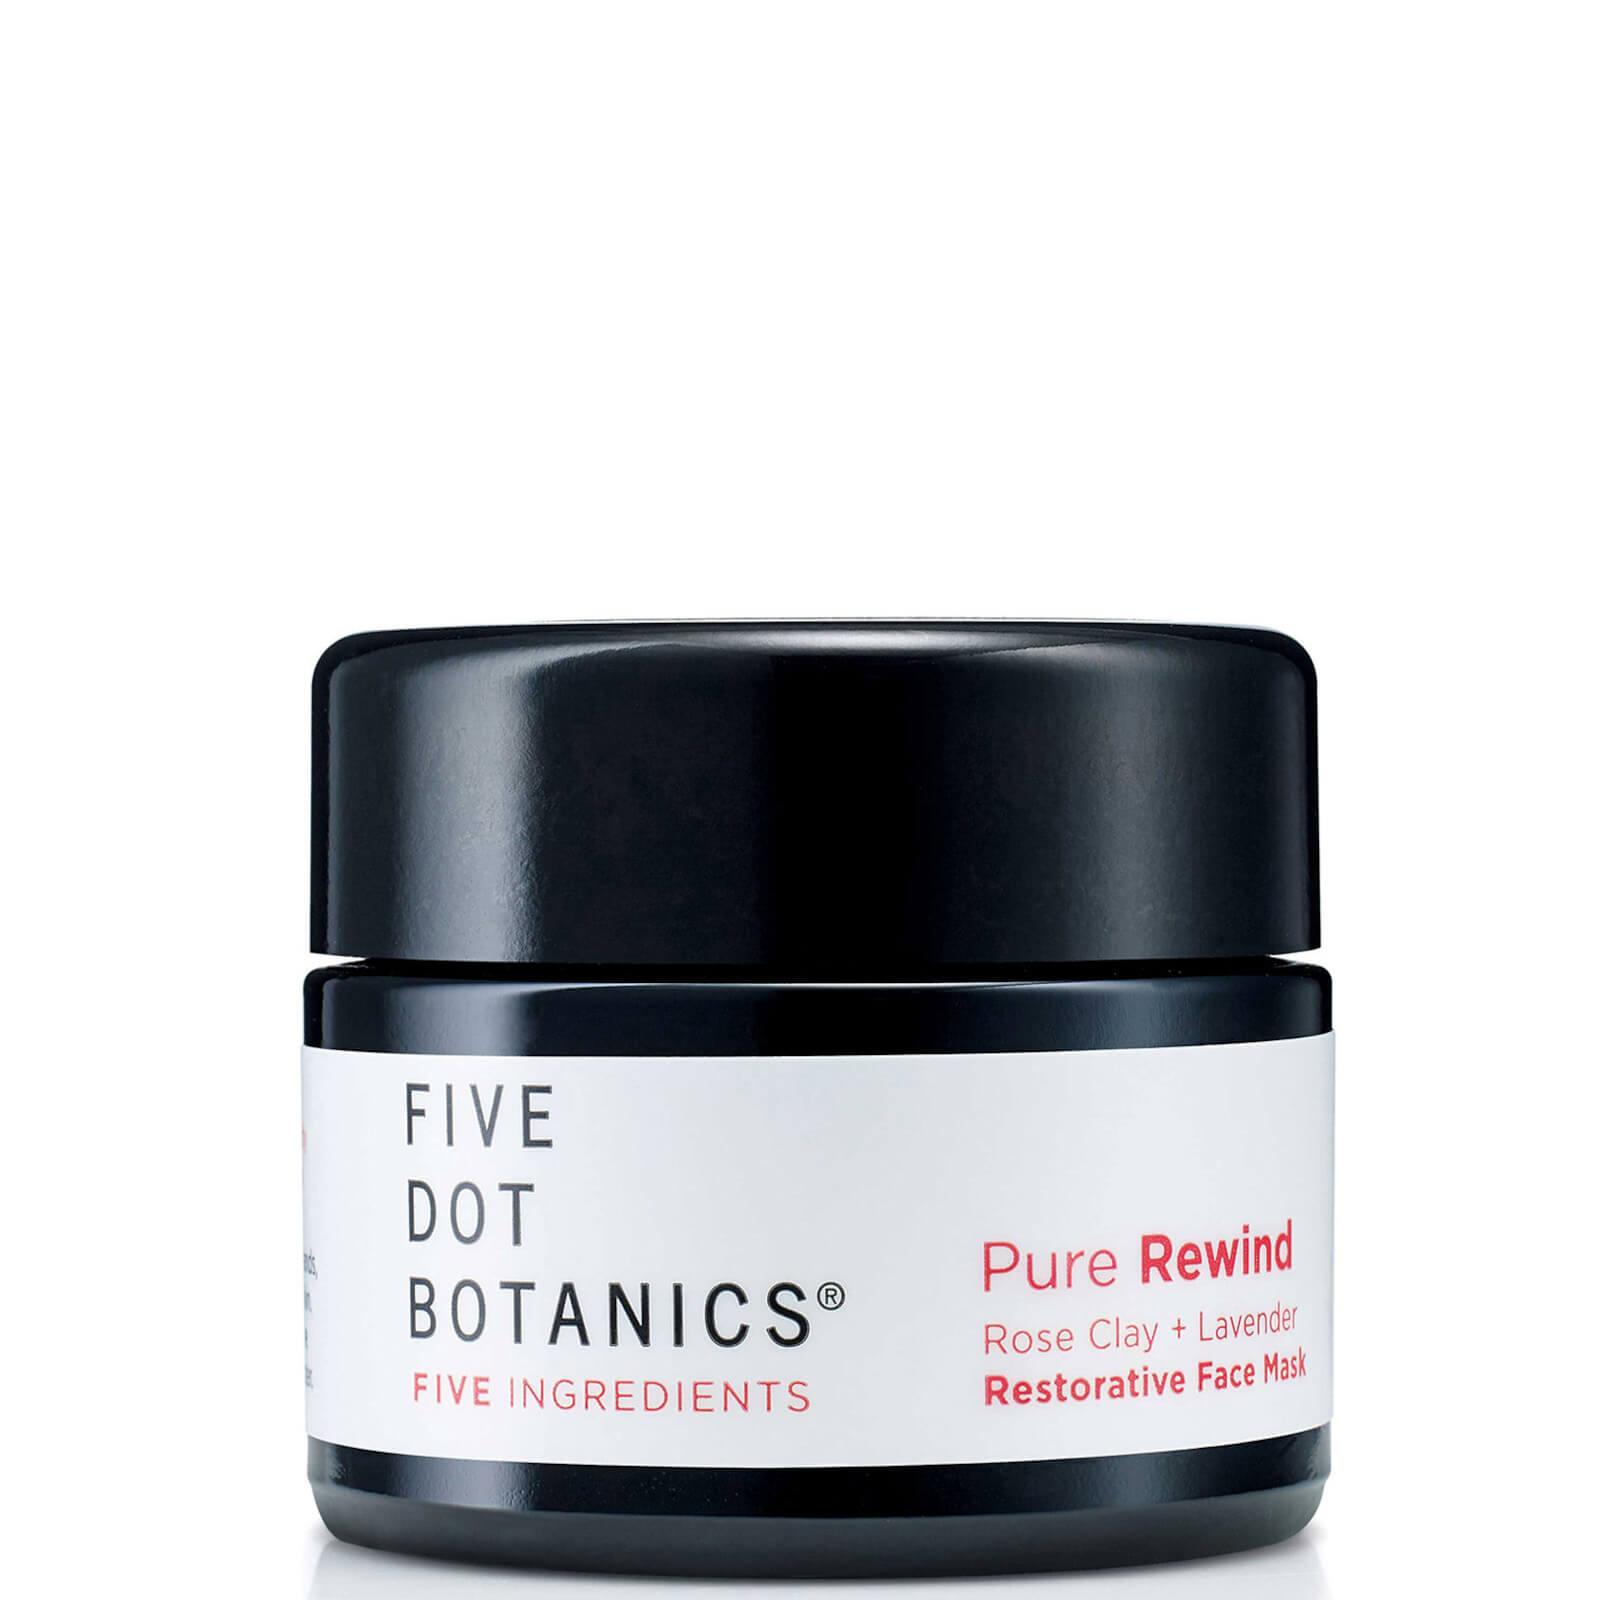 Купить Five Dot Botanics Pure Rewind Rose Clay and Lavender Restorative Face Mask 30ml